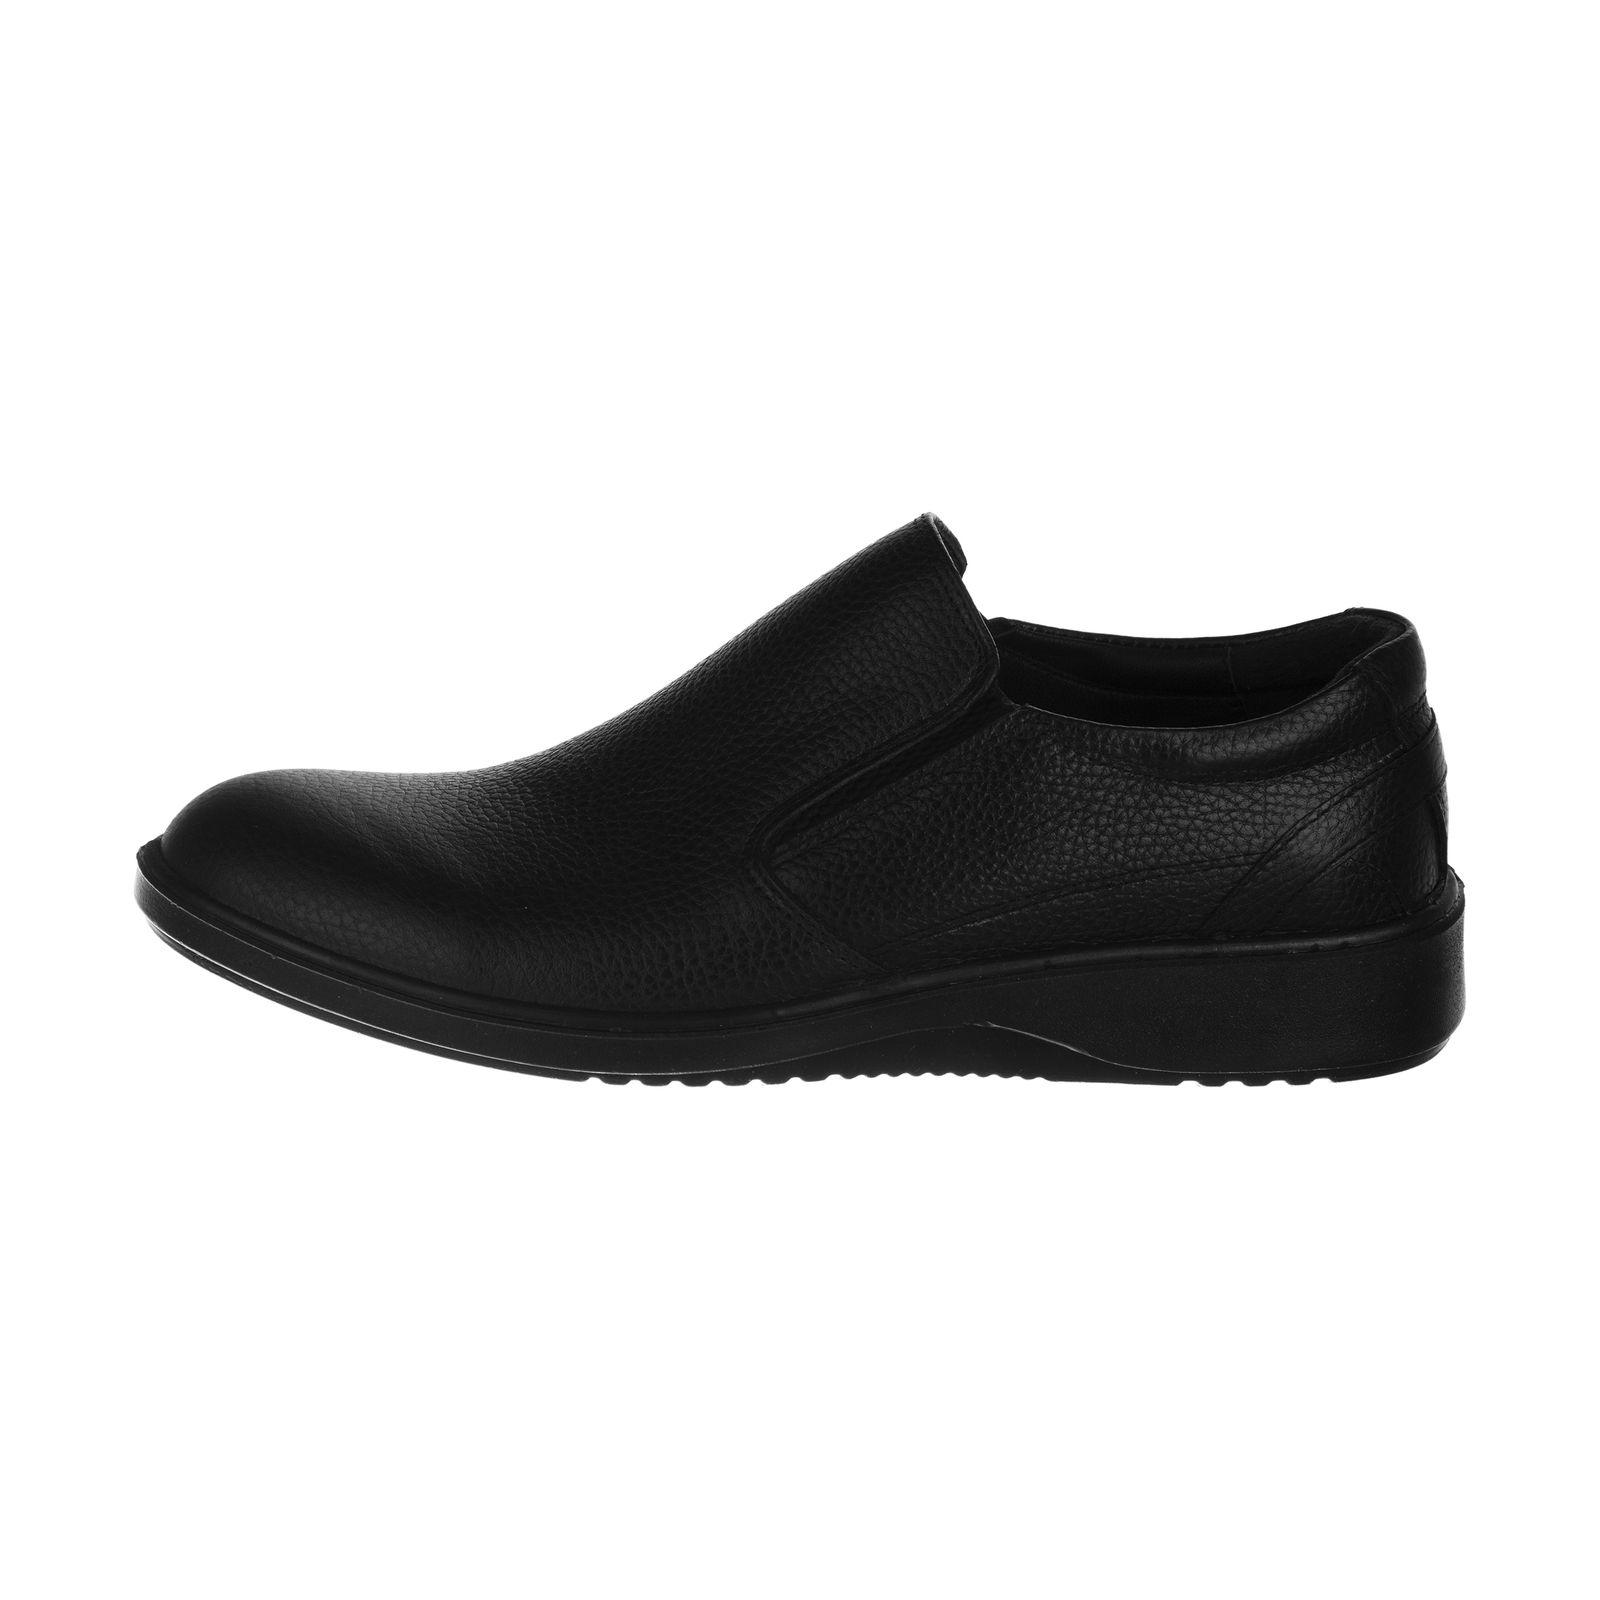 کفش روزمره مردانه ریمکس مدل 7327A503101 -  - 2